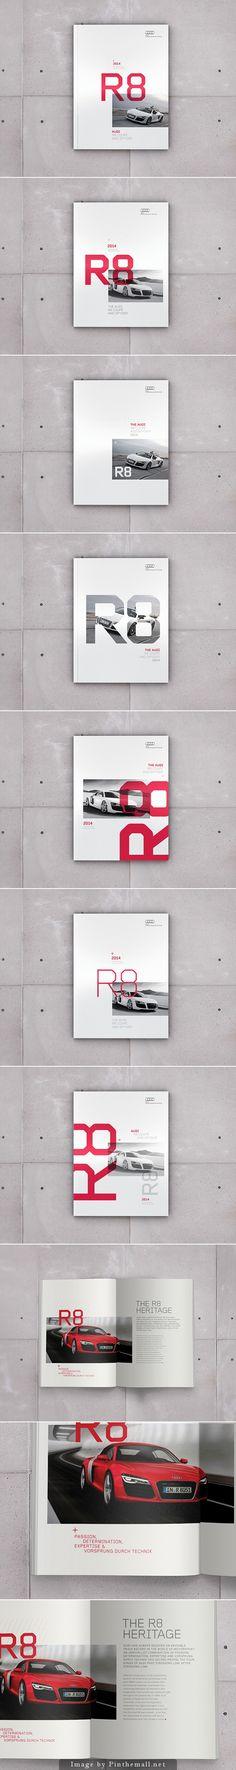 Audi R8 Brochure Editorial Design, Graphic Design, Print Design Project By…